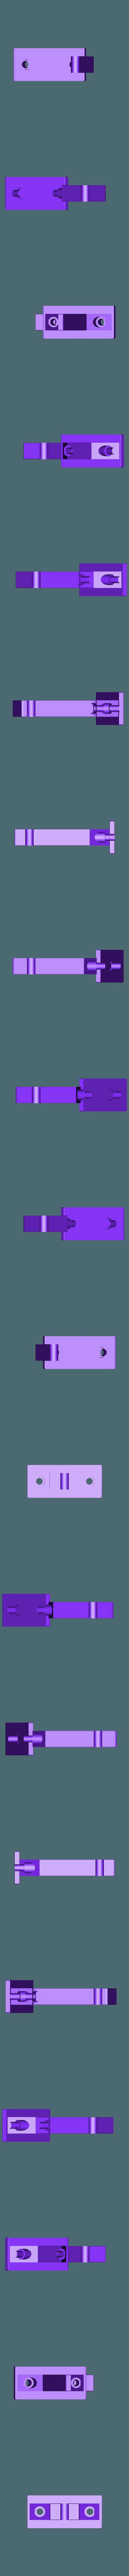 PLAzzy_LED-Dog-Lamp_neck.stl Download free STL file PLAzzy Lamp (Dog), LED 12V 2.5W • 3D printer model, Seabird